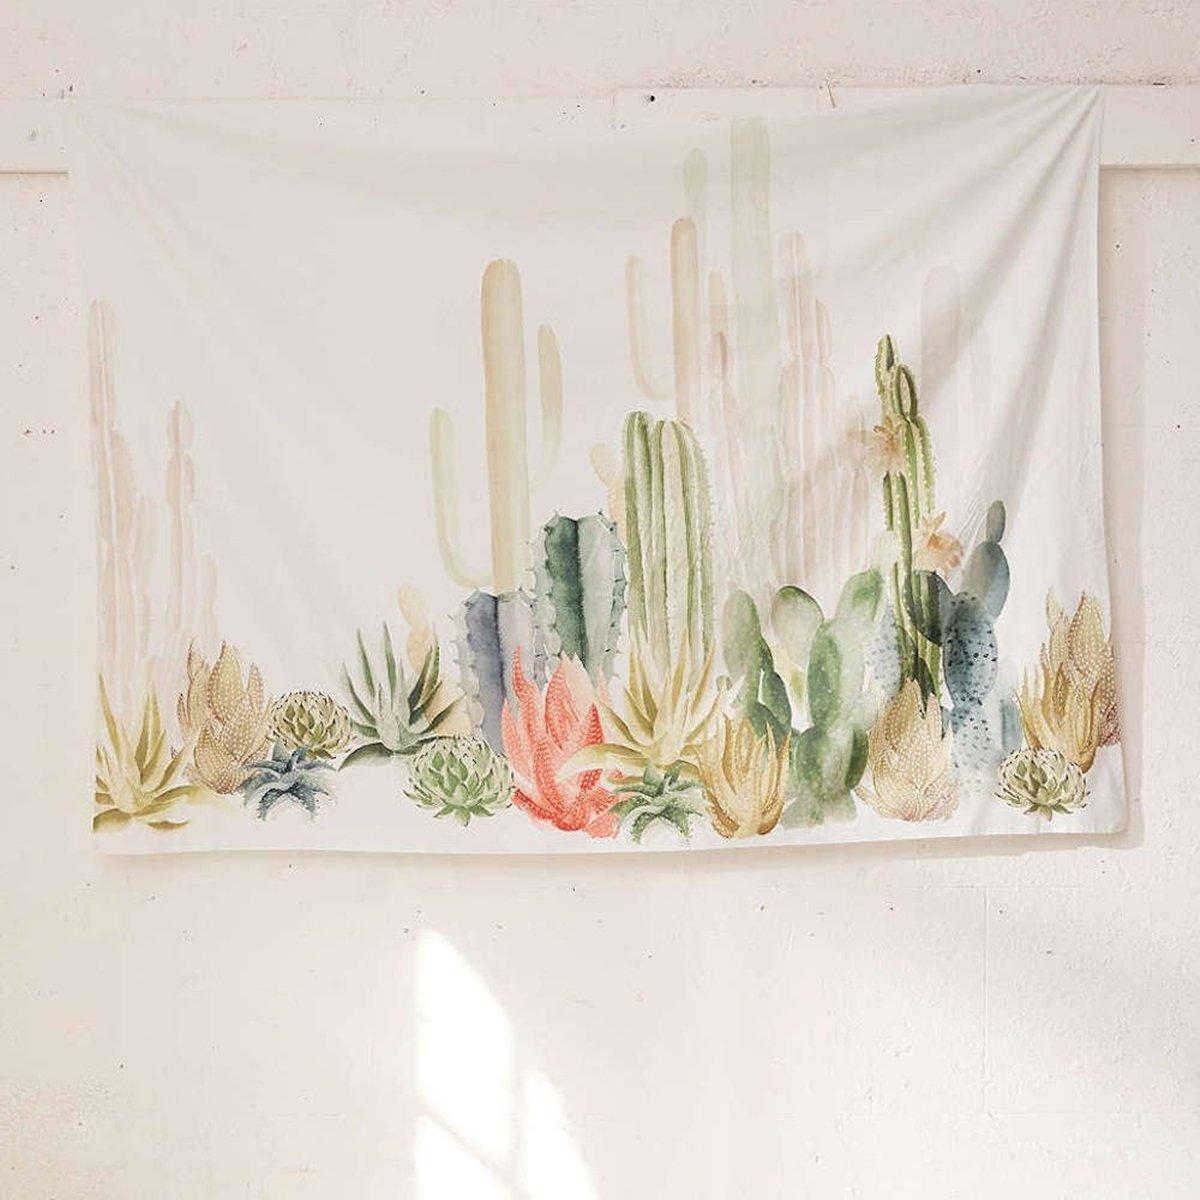 Jeteven Tropical Desert Plant Tapestry Cactus Wall Hanging Beach Towel Home Living Room Creative Art Decor 79''X59''